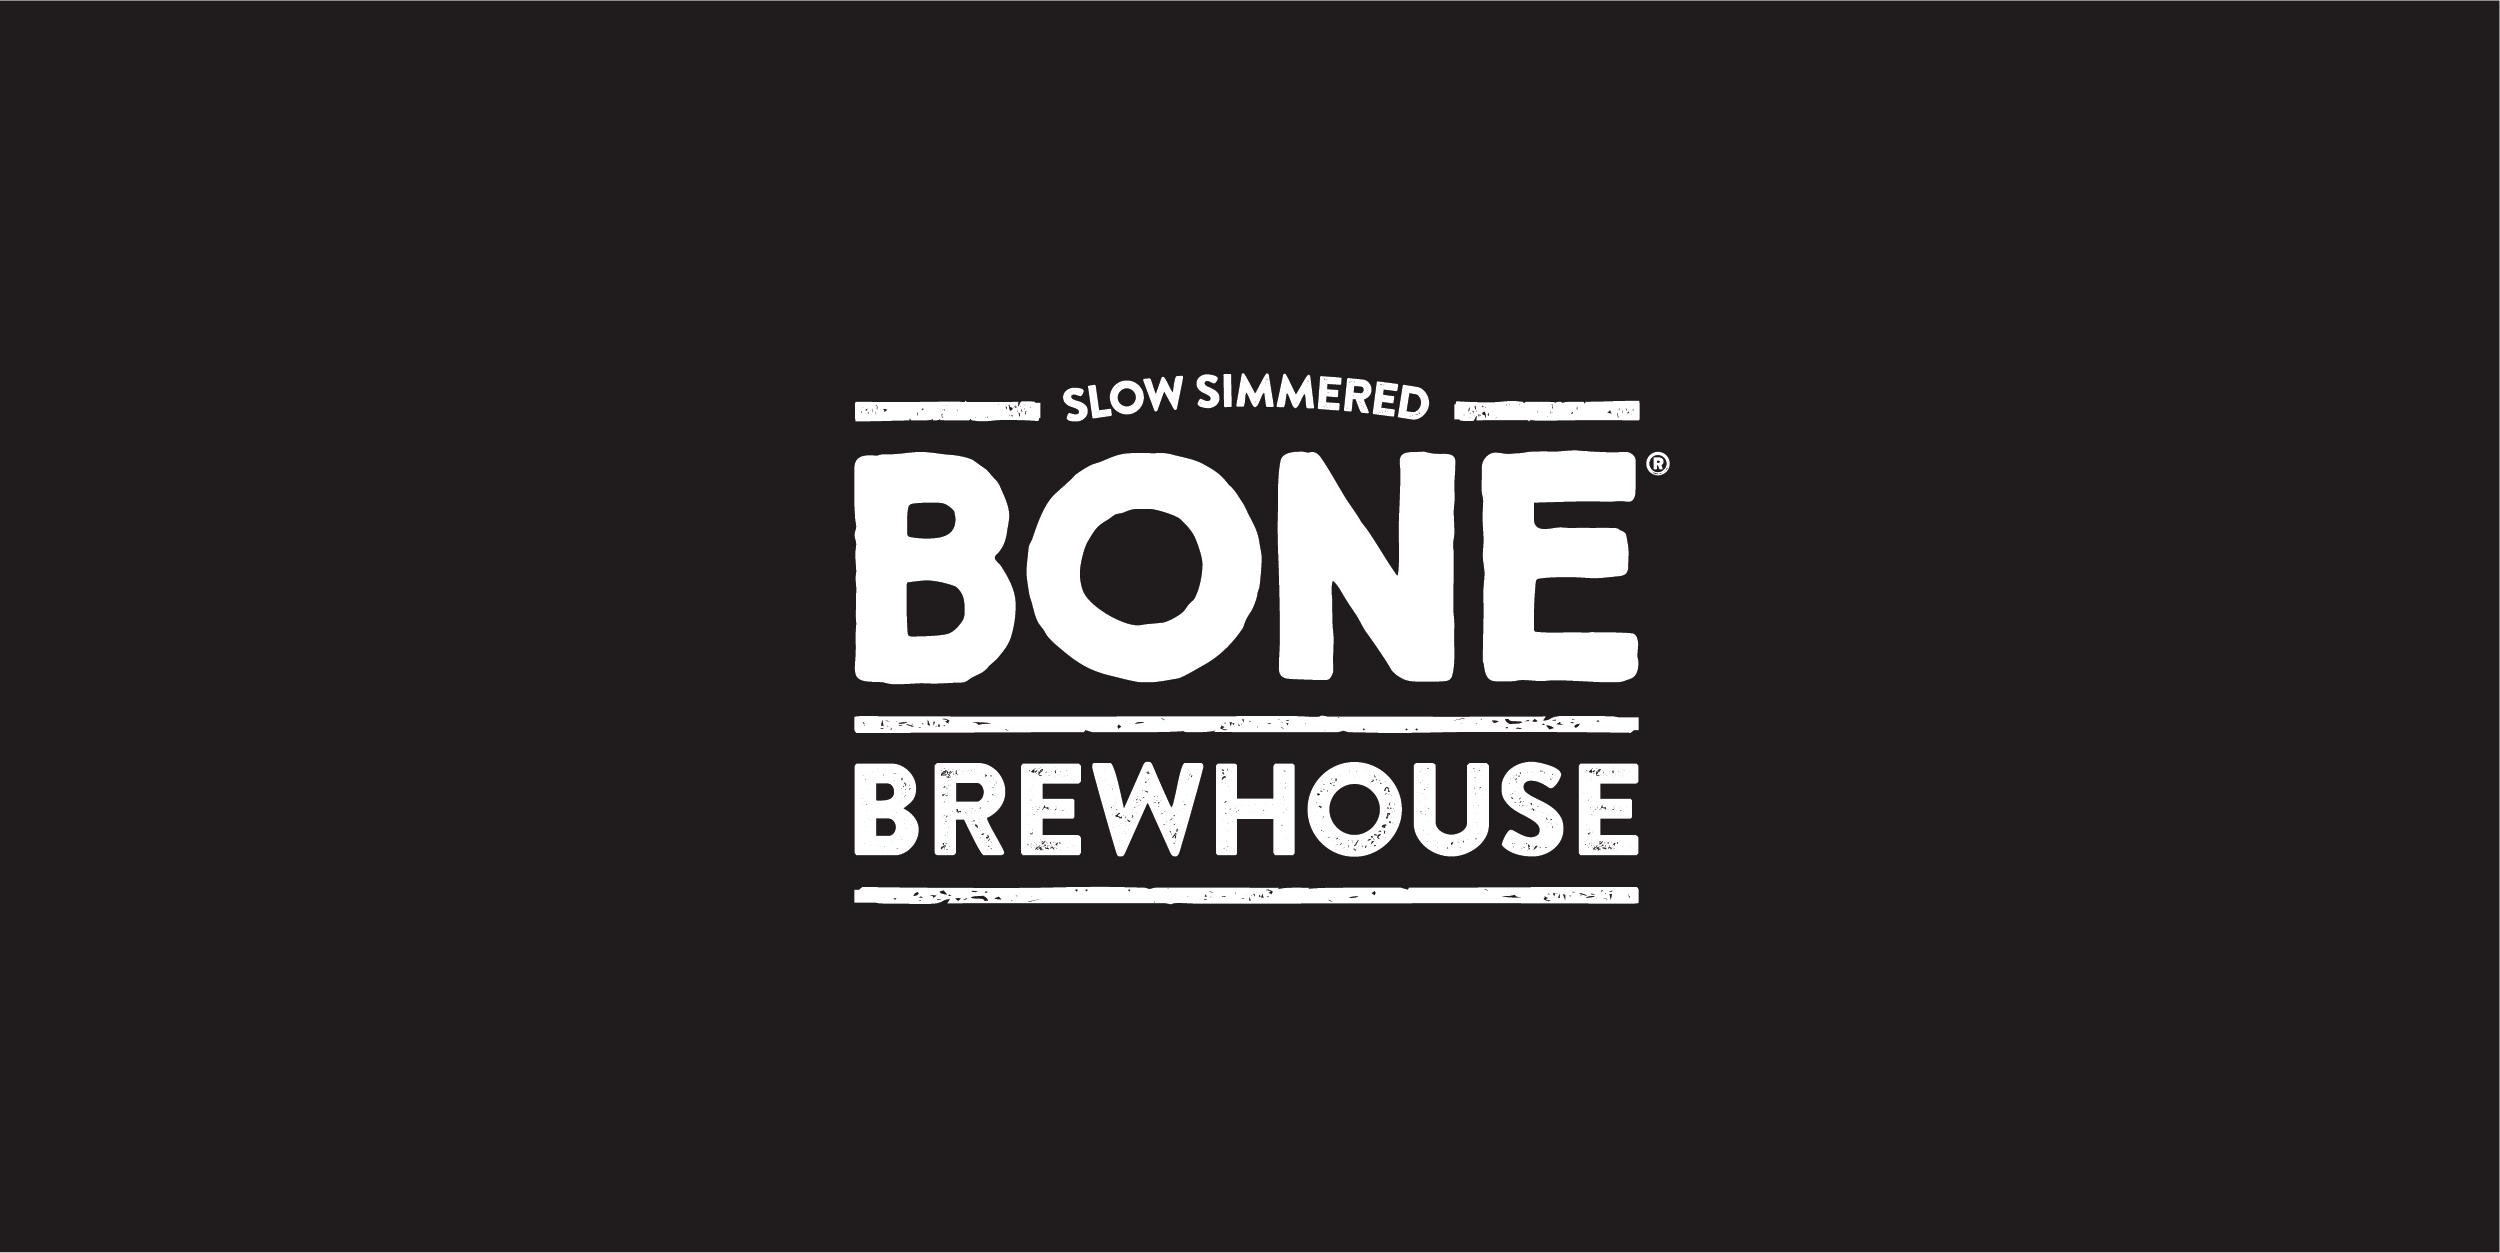 BoneBrewHouse_Ebbnflowcreative_branding_Logo.jpg